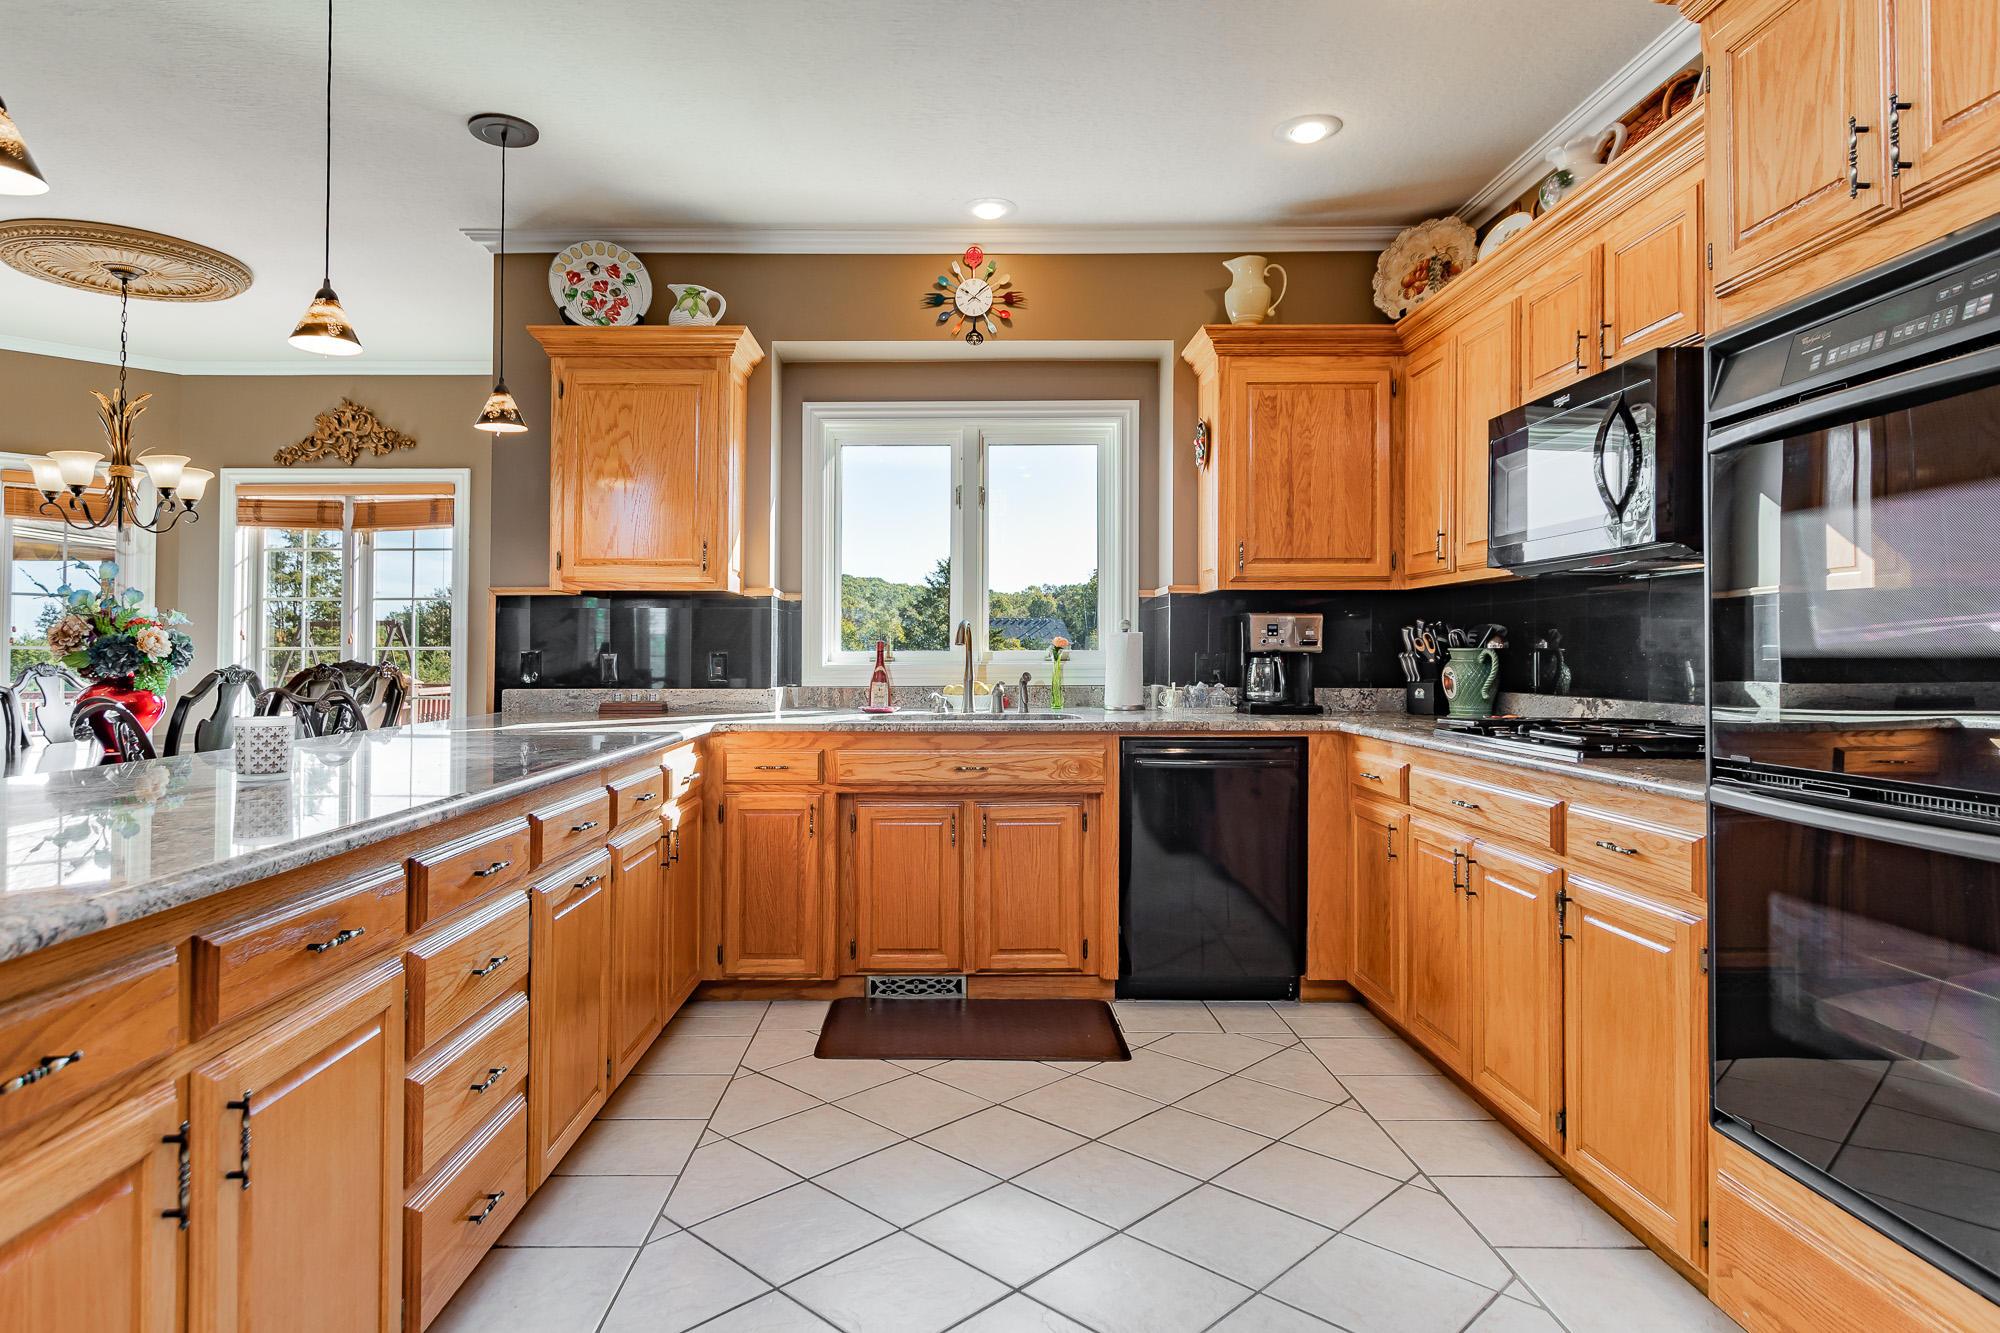 832 South Lloyd Drive Rogersville, MO 65742